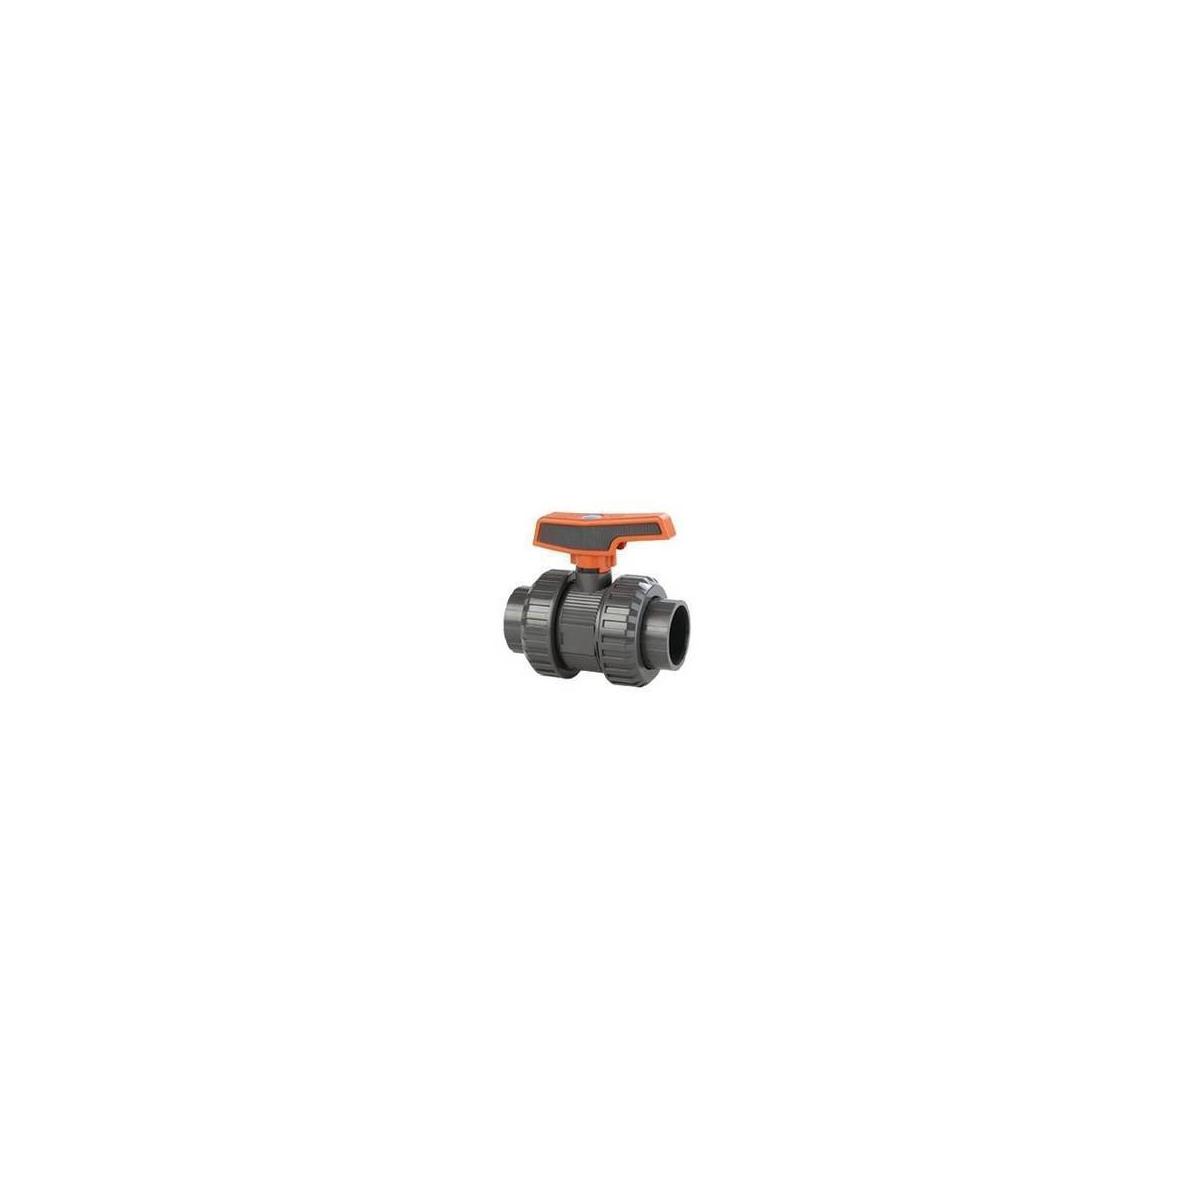 PVC-U [STD] BALL VALVE (PE-EPDM) BSP female thread